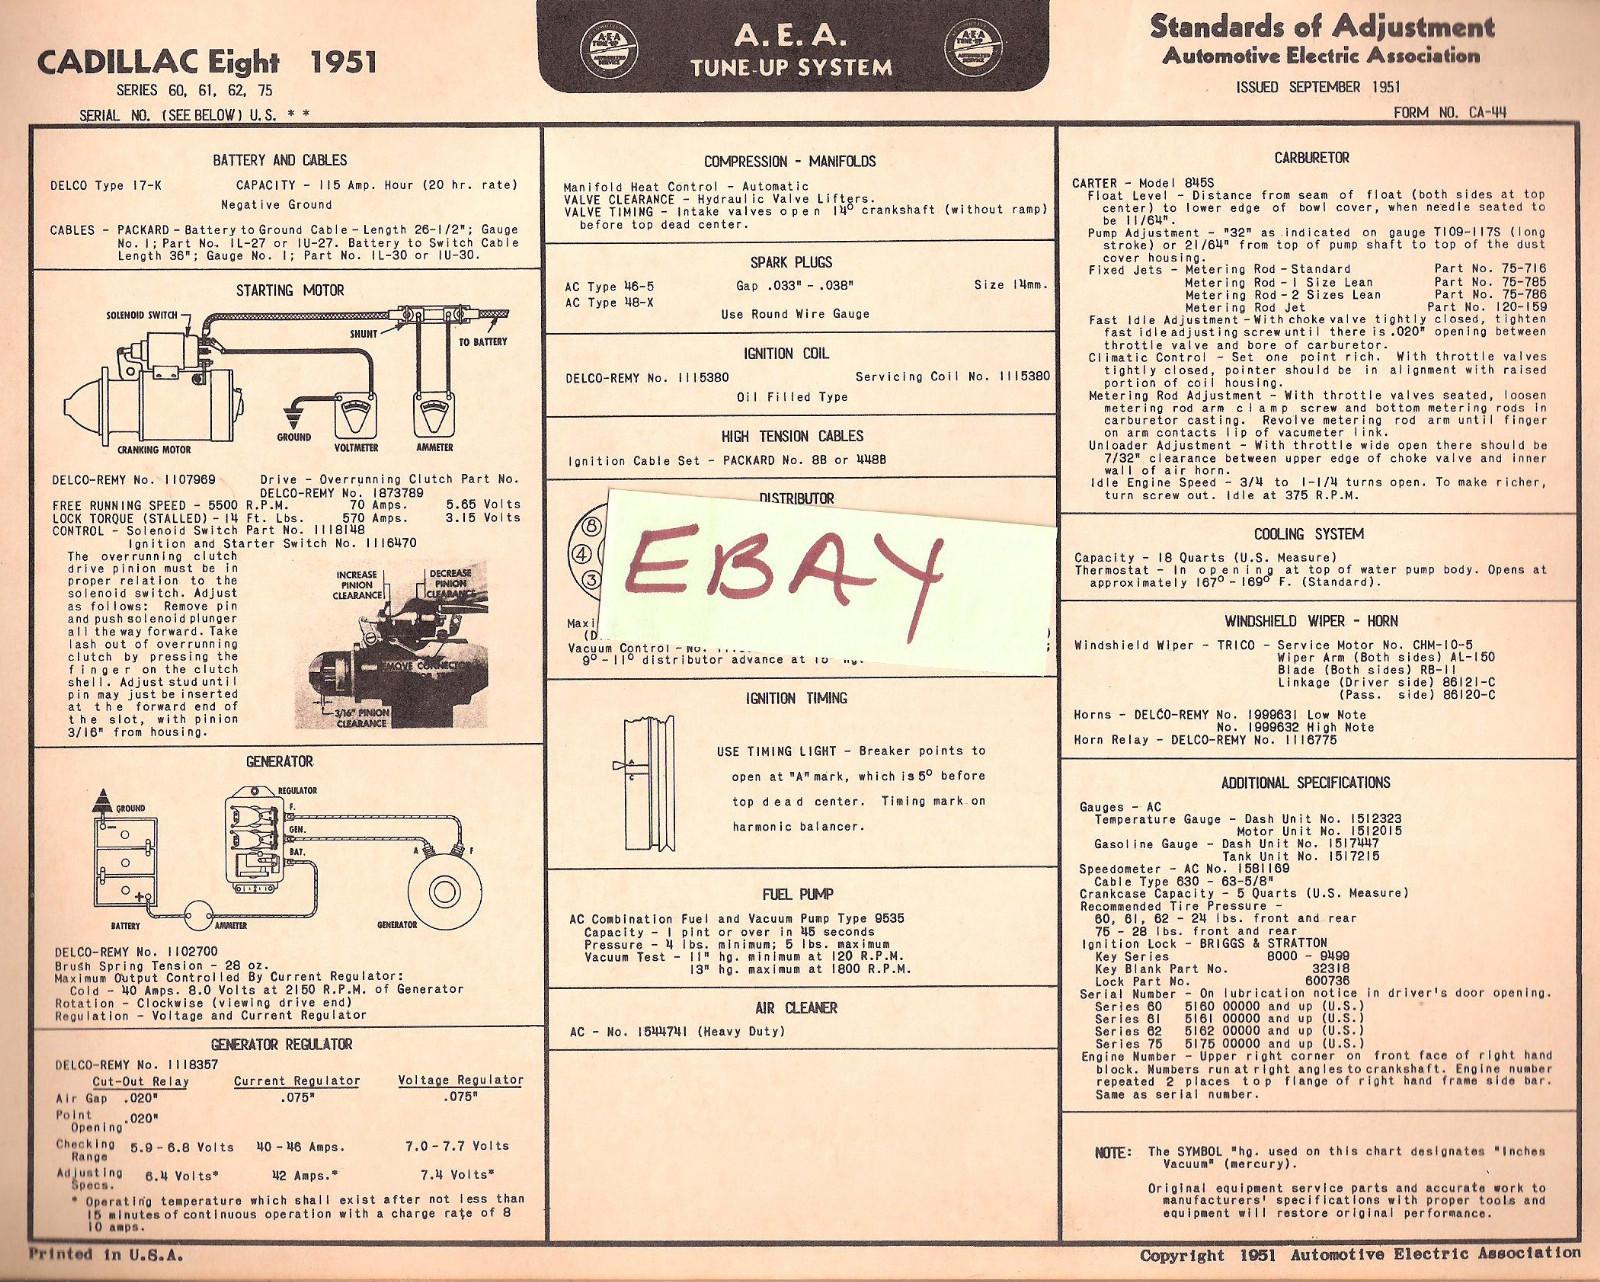 1951 aea tune up chart wiring diagram and similar items rh bonanza com